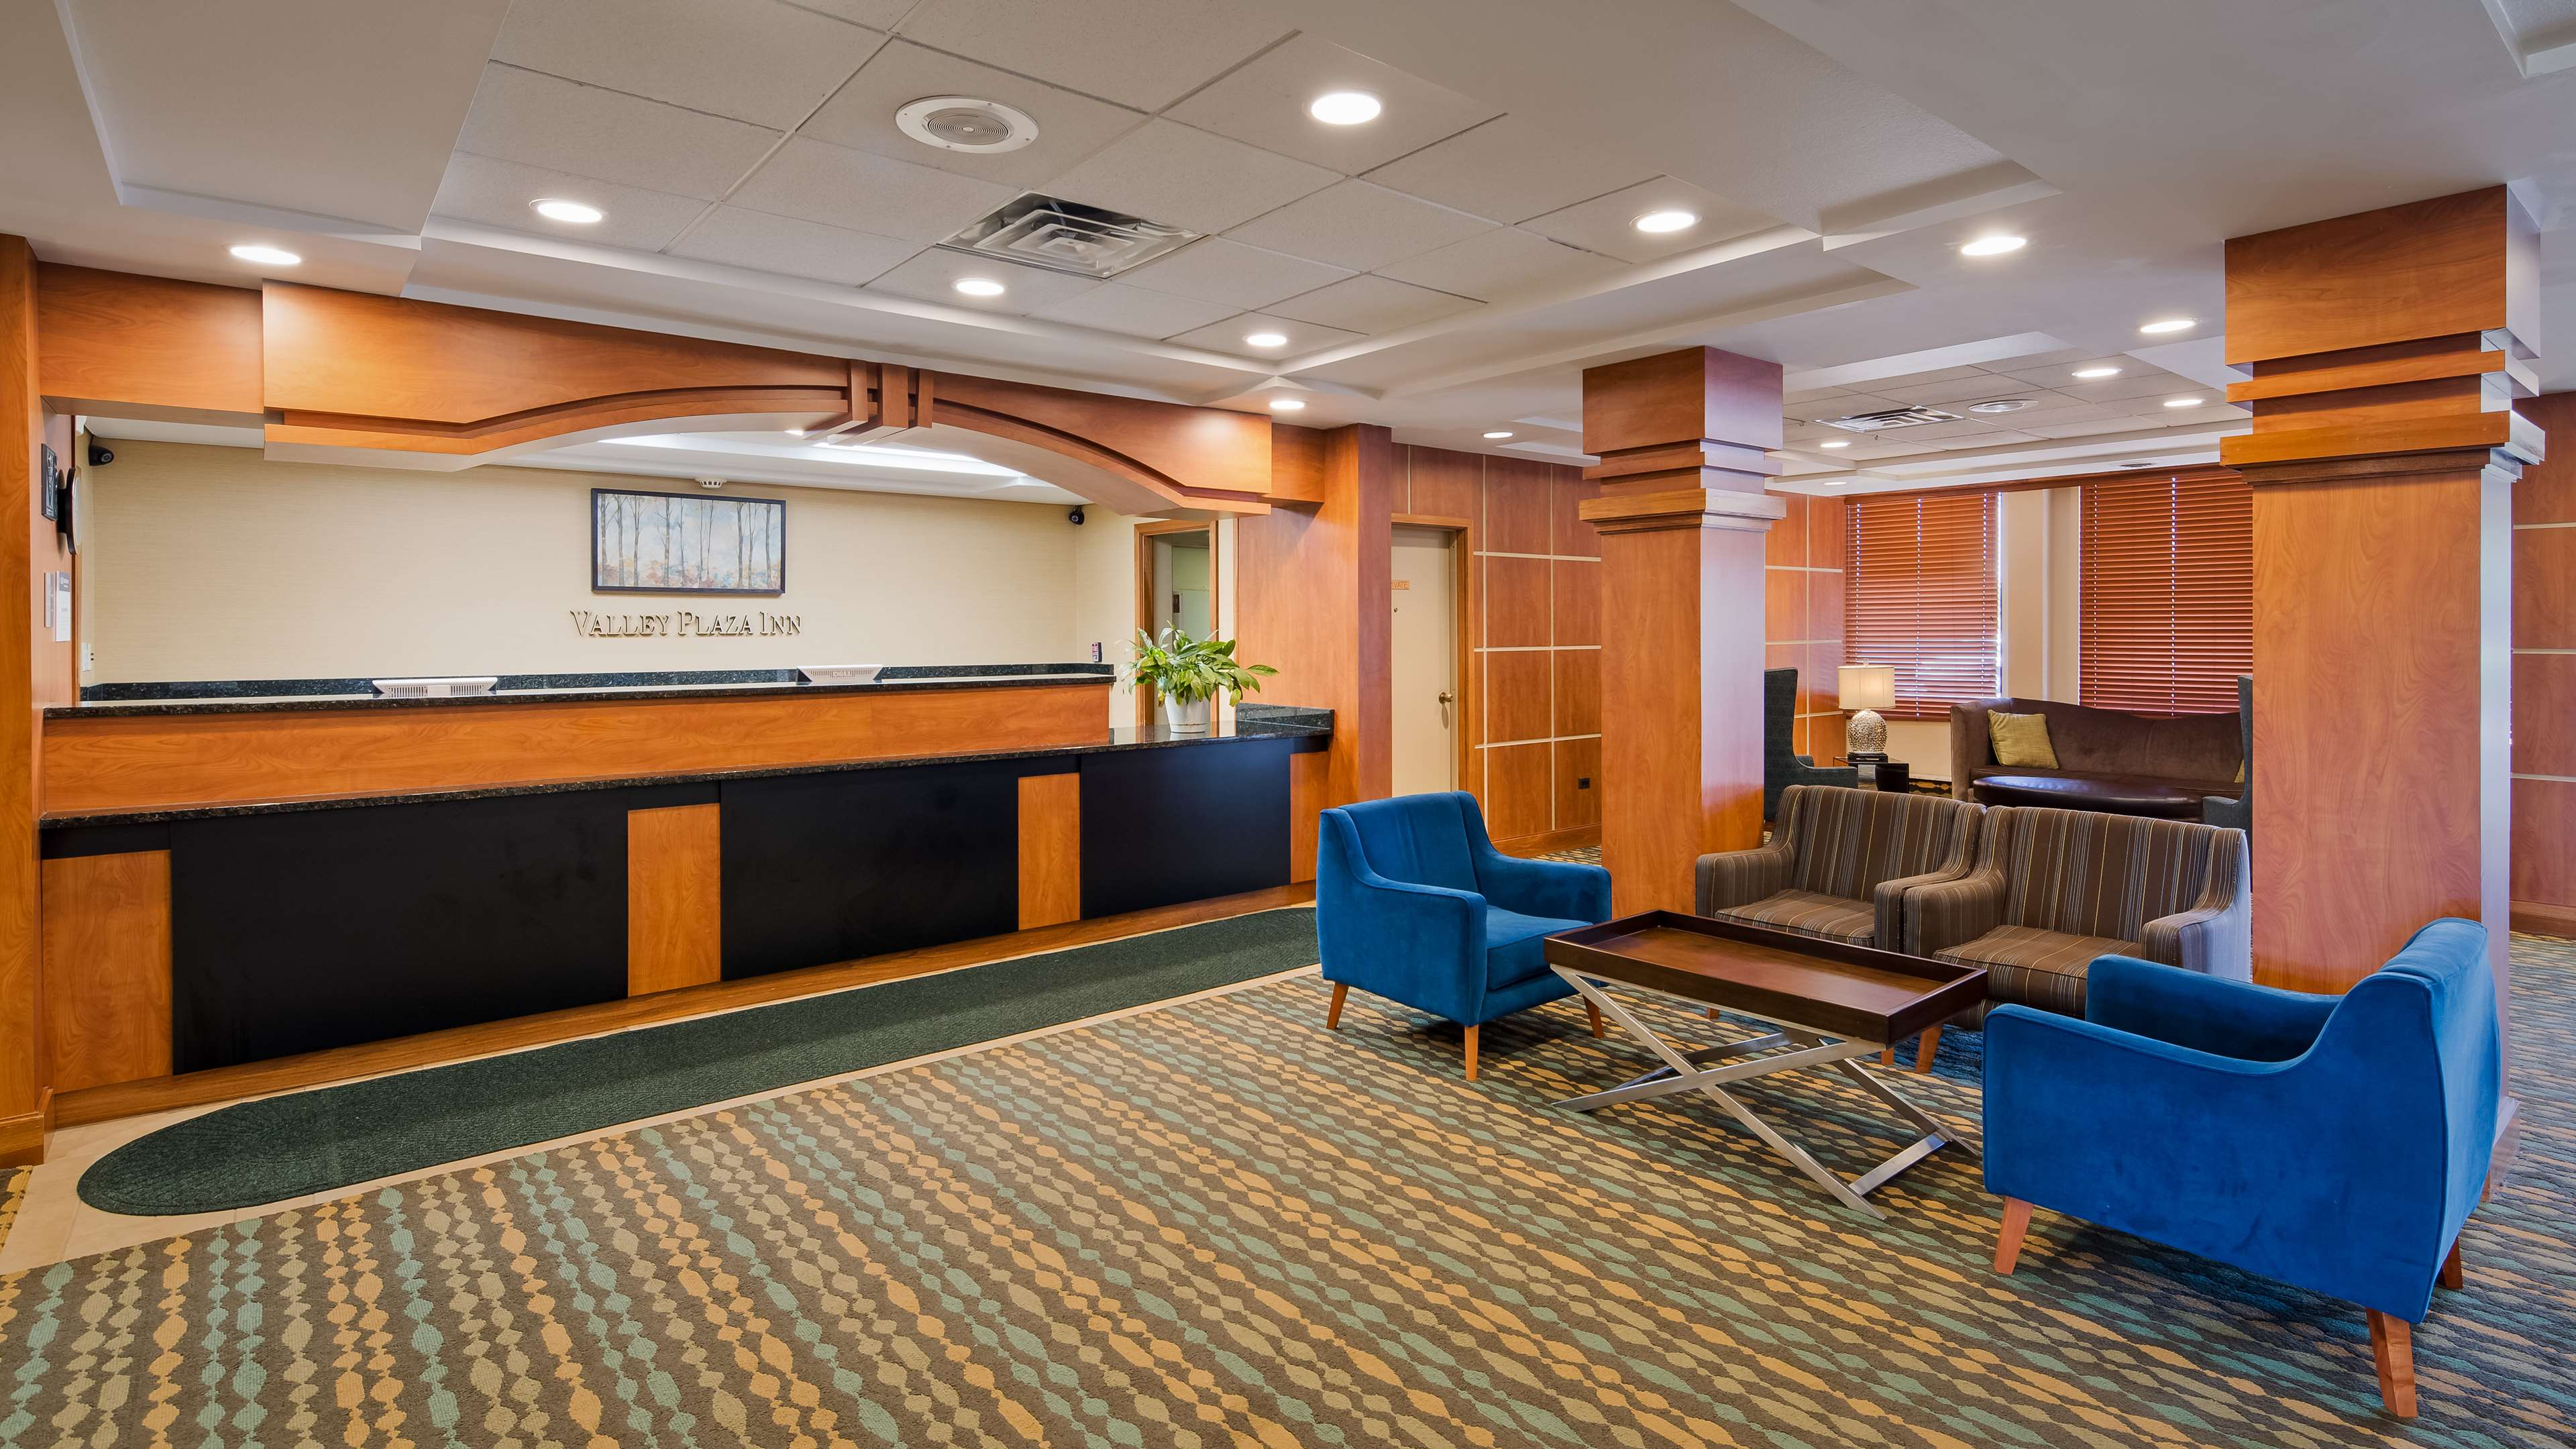 Best Western Valley Plaza Inn image 4